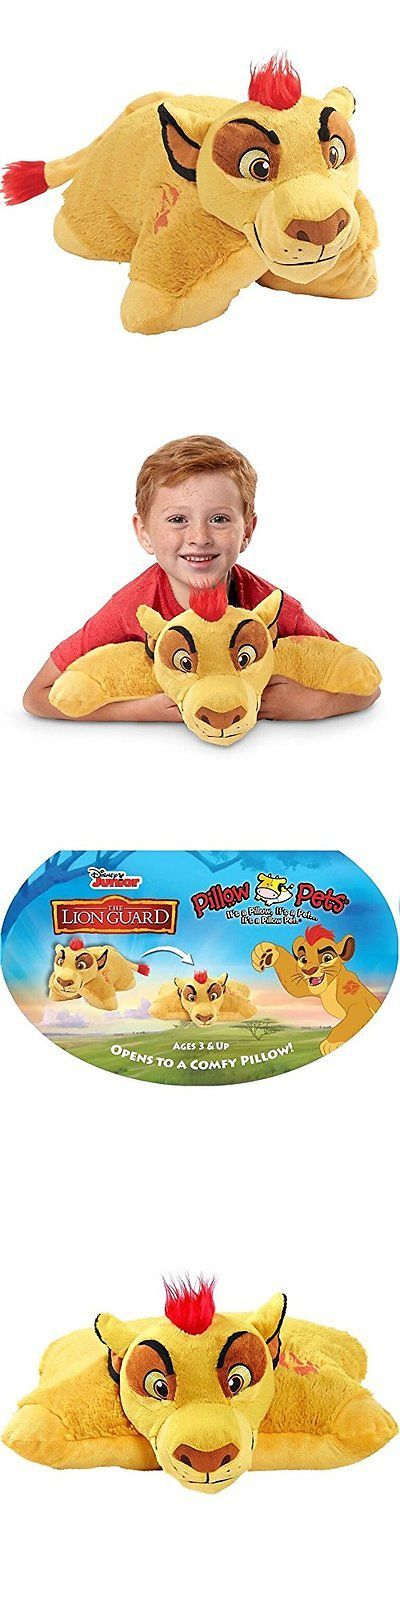 Disney 2597: Disney Lion Guard Pillow Pets - Kion Stuffed Animal Plush Toy -> BUY IT NOW ONLY: $34.51 on eBay!